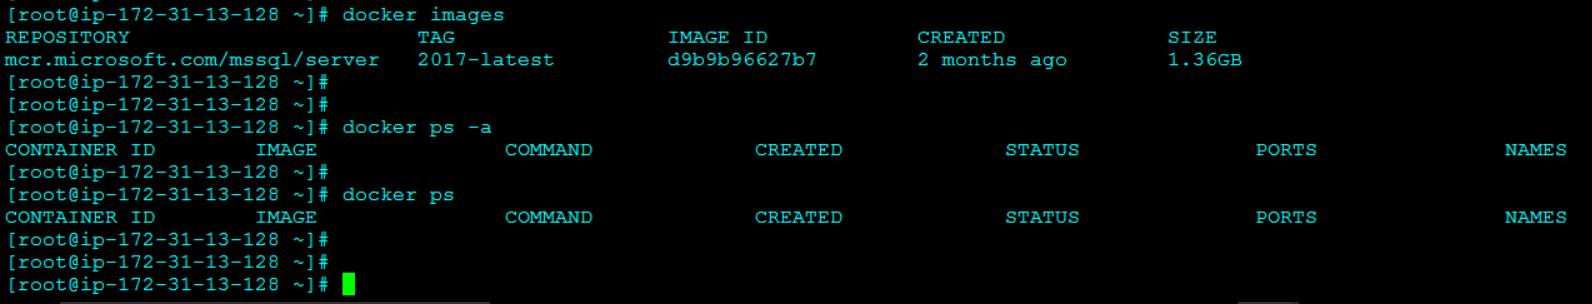 Updated Docker Image List